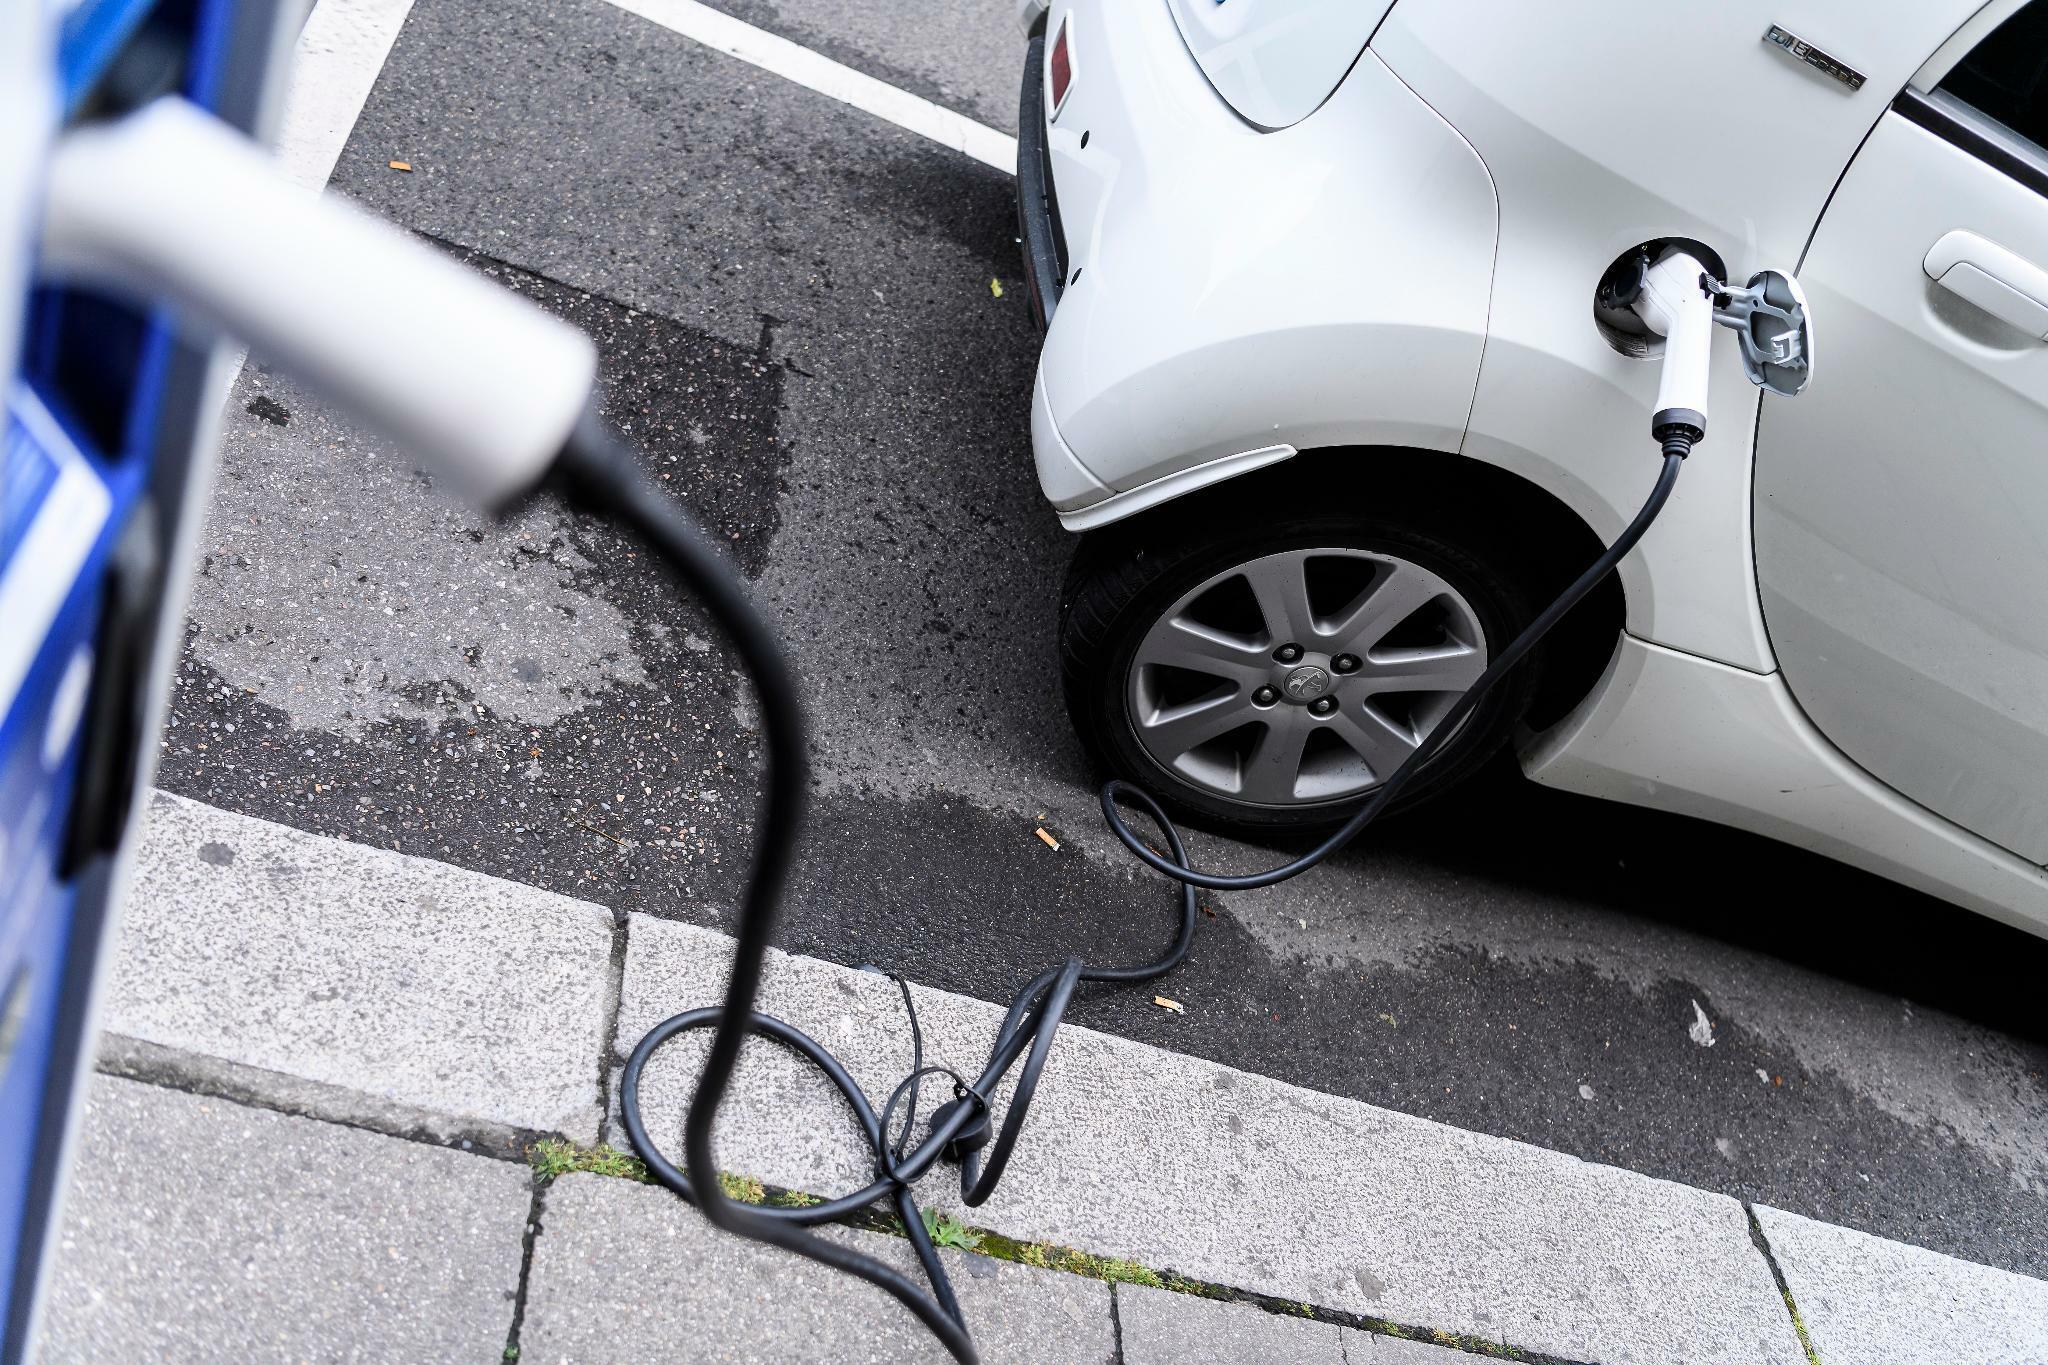 FDP: Bundesregierung rechnet sich E-Autos schön